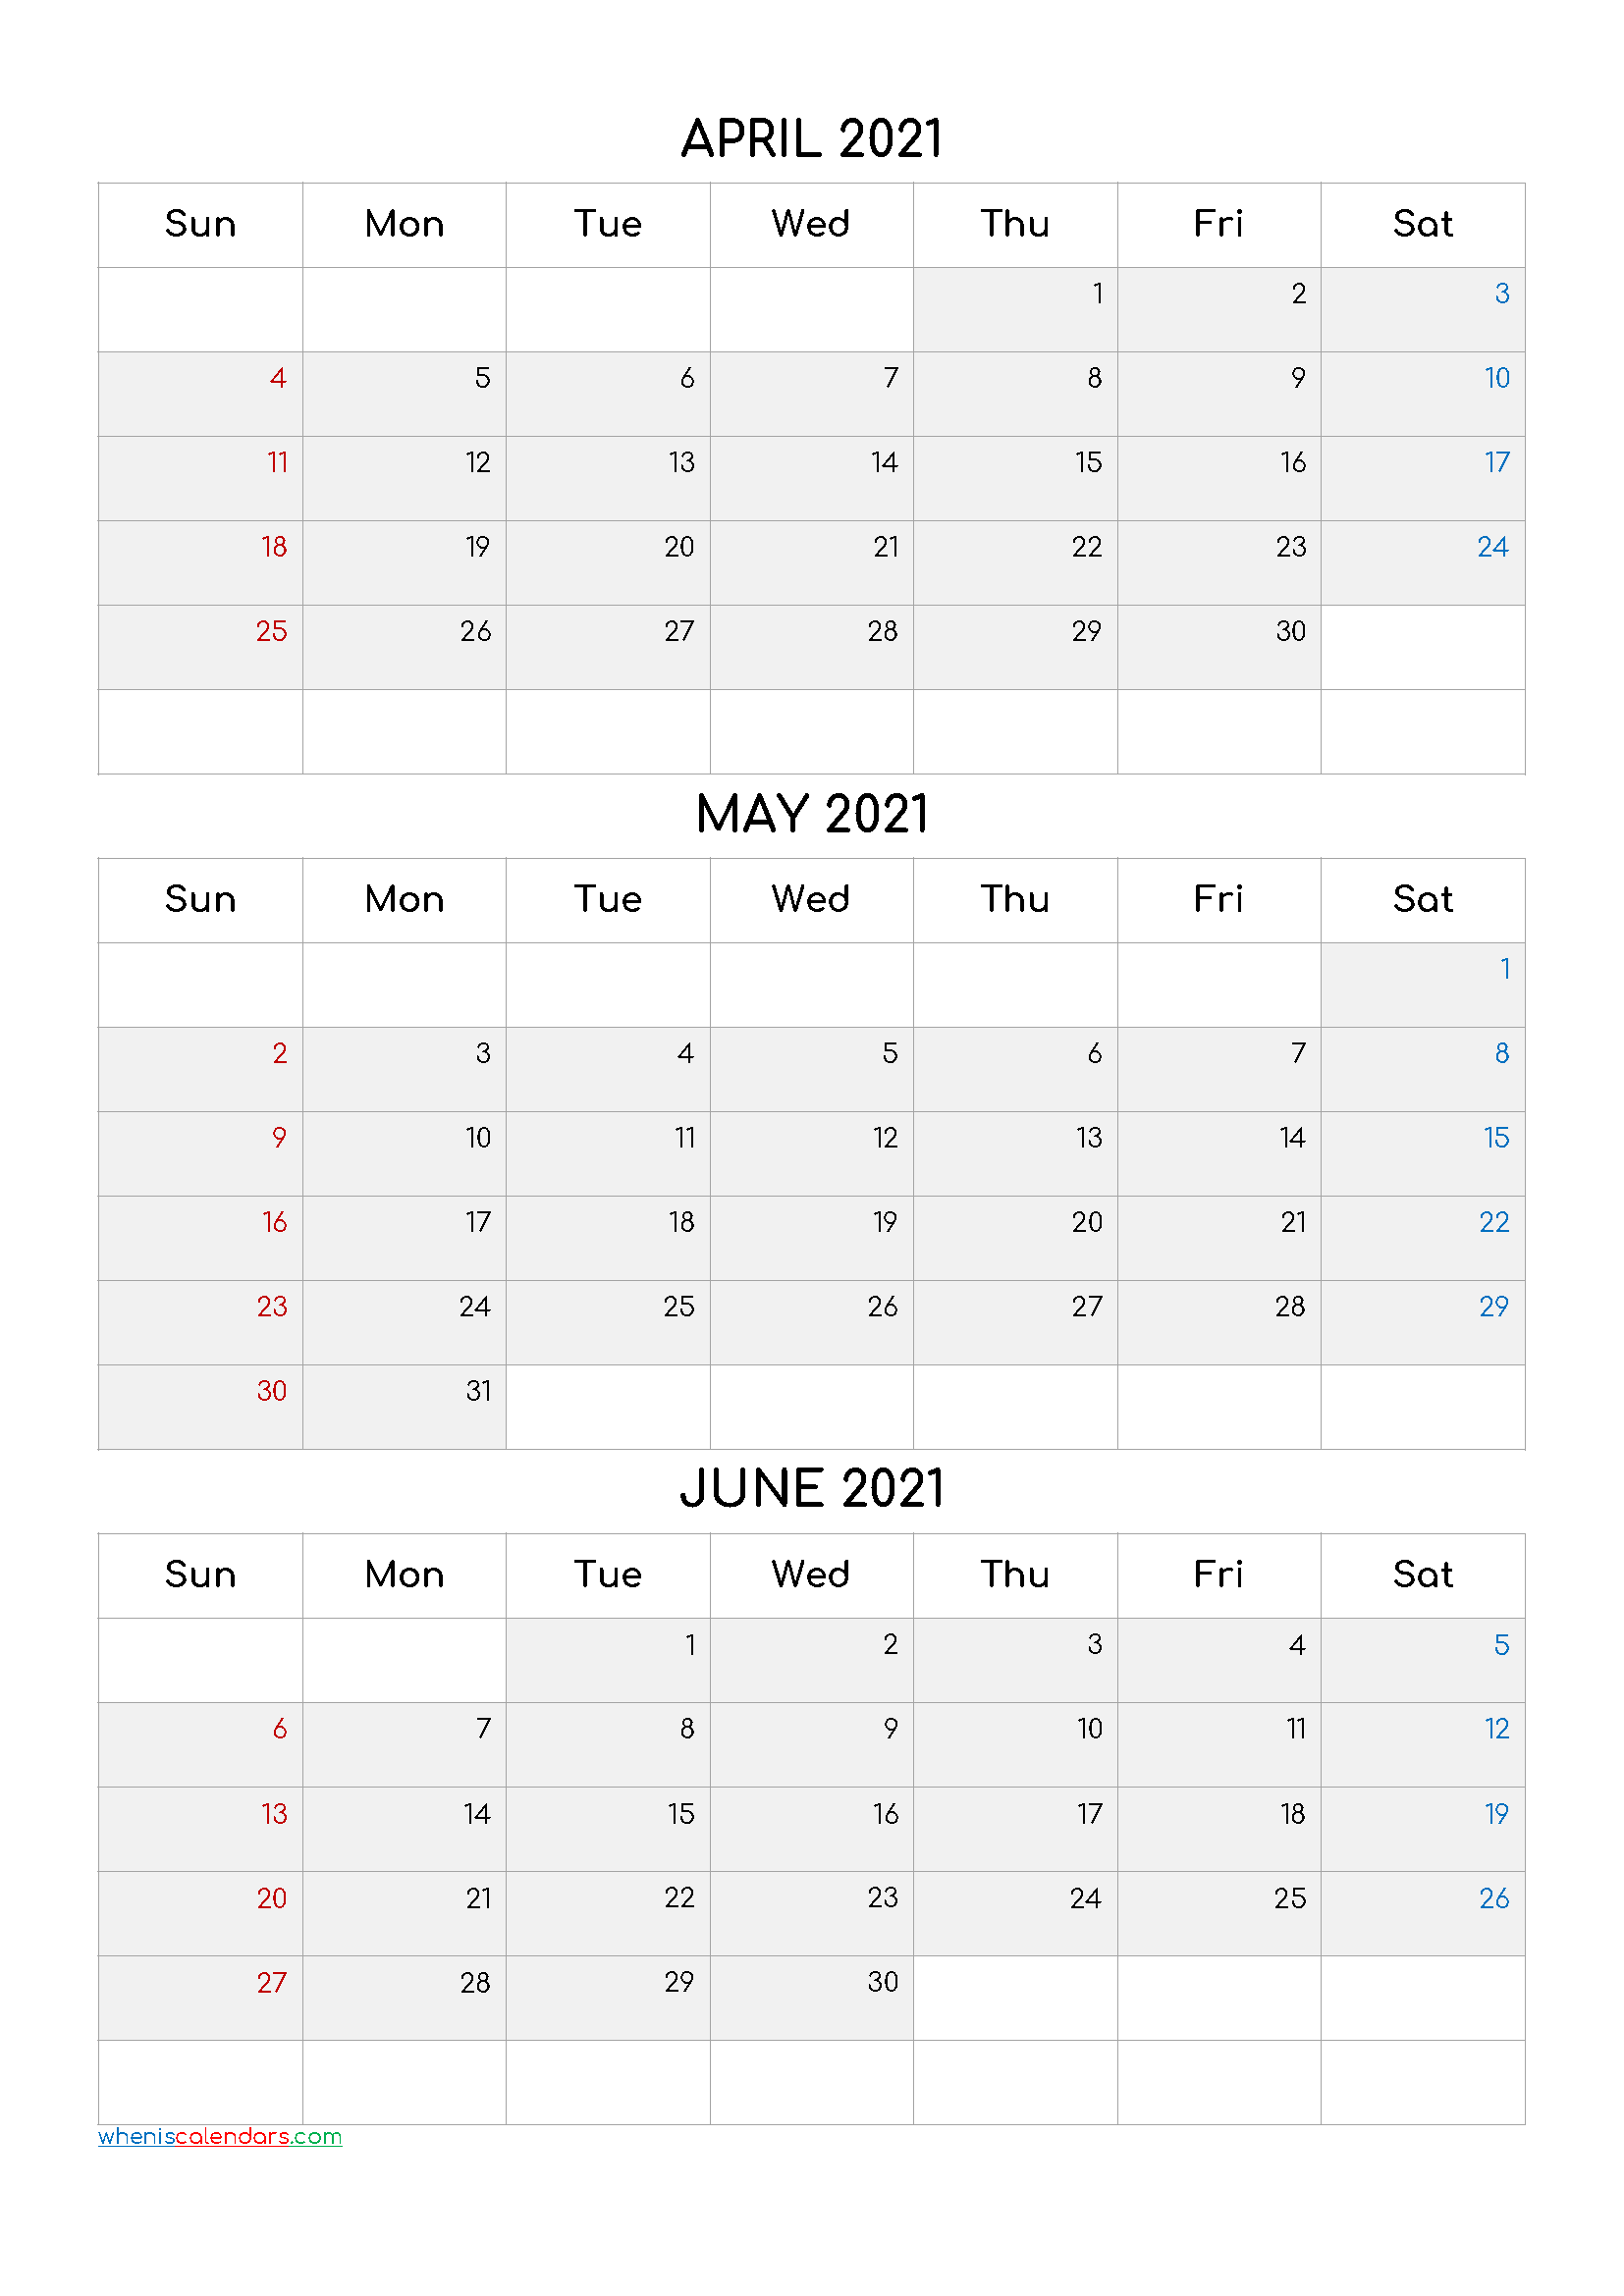 Free January February March 2021 Calendar - Calendraex Inside January February March April 2021 Calendar